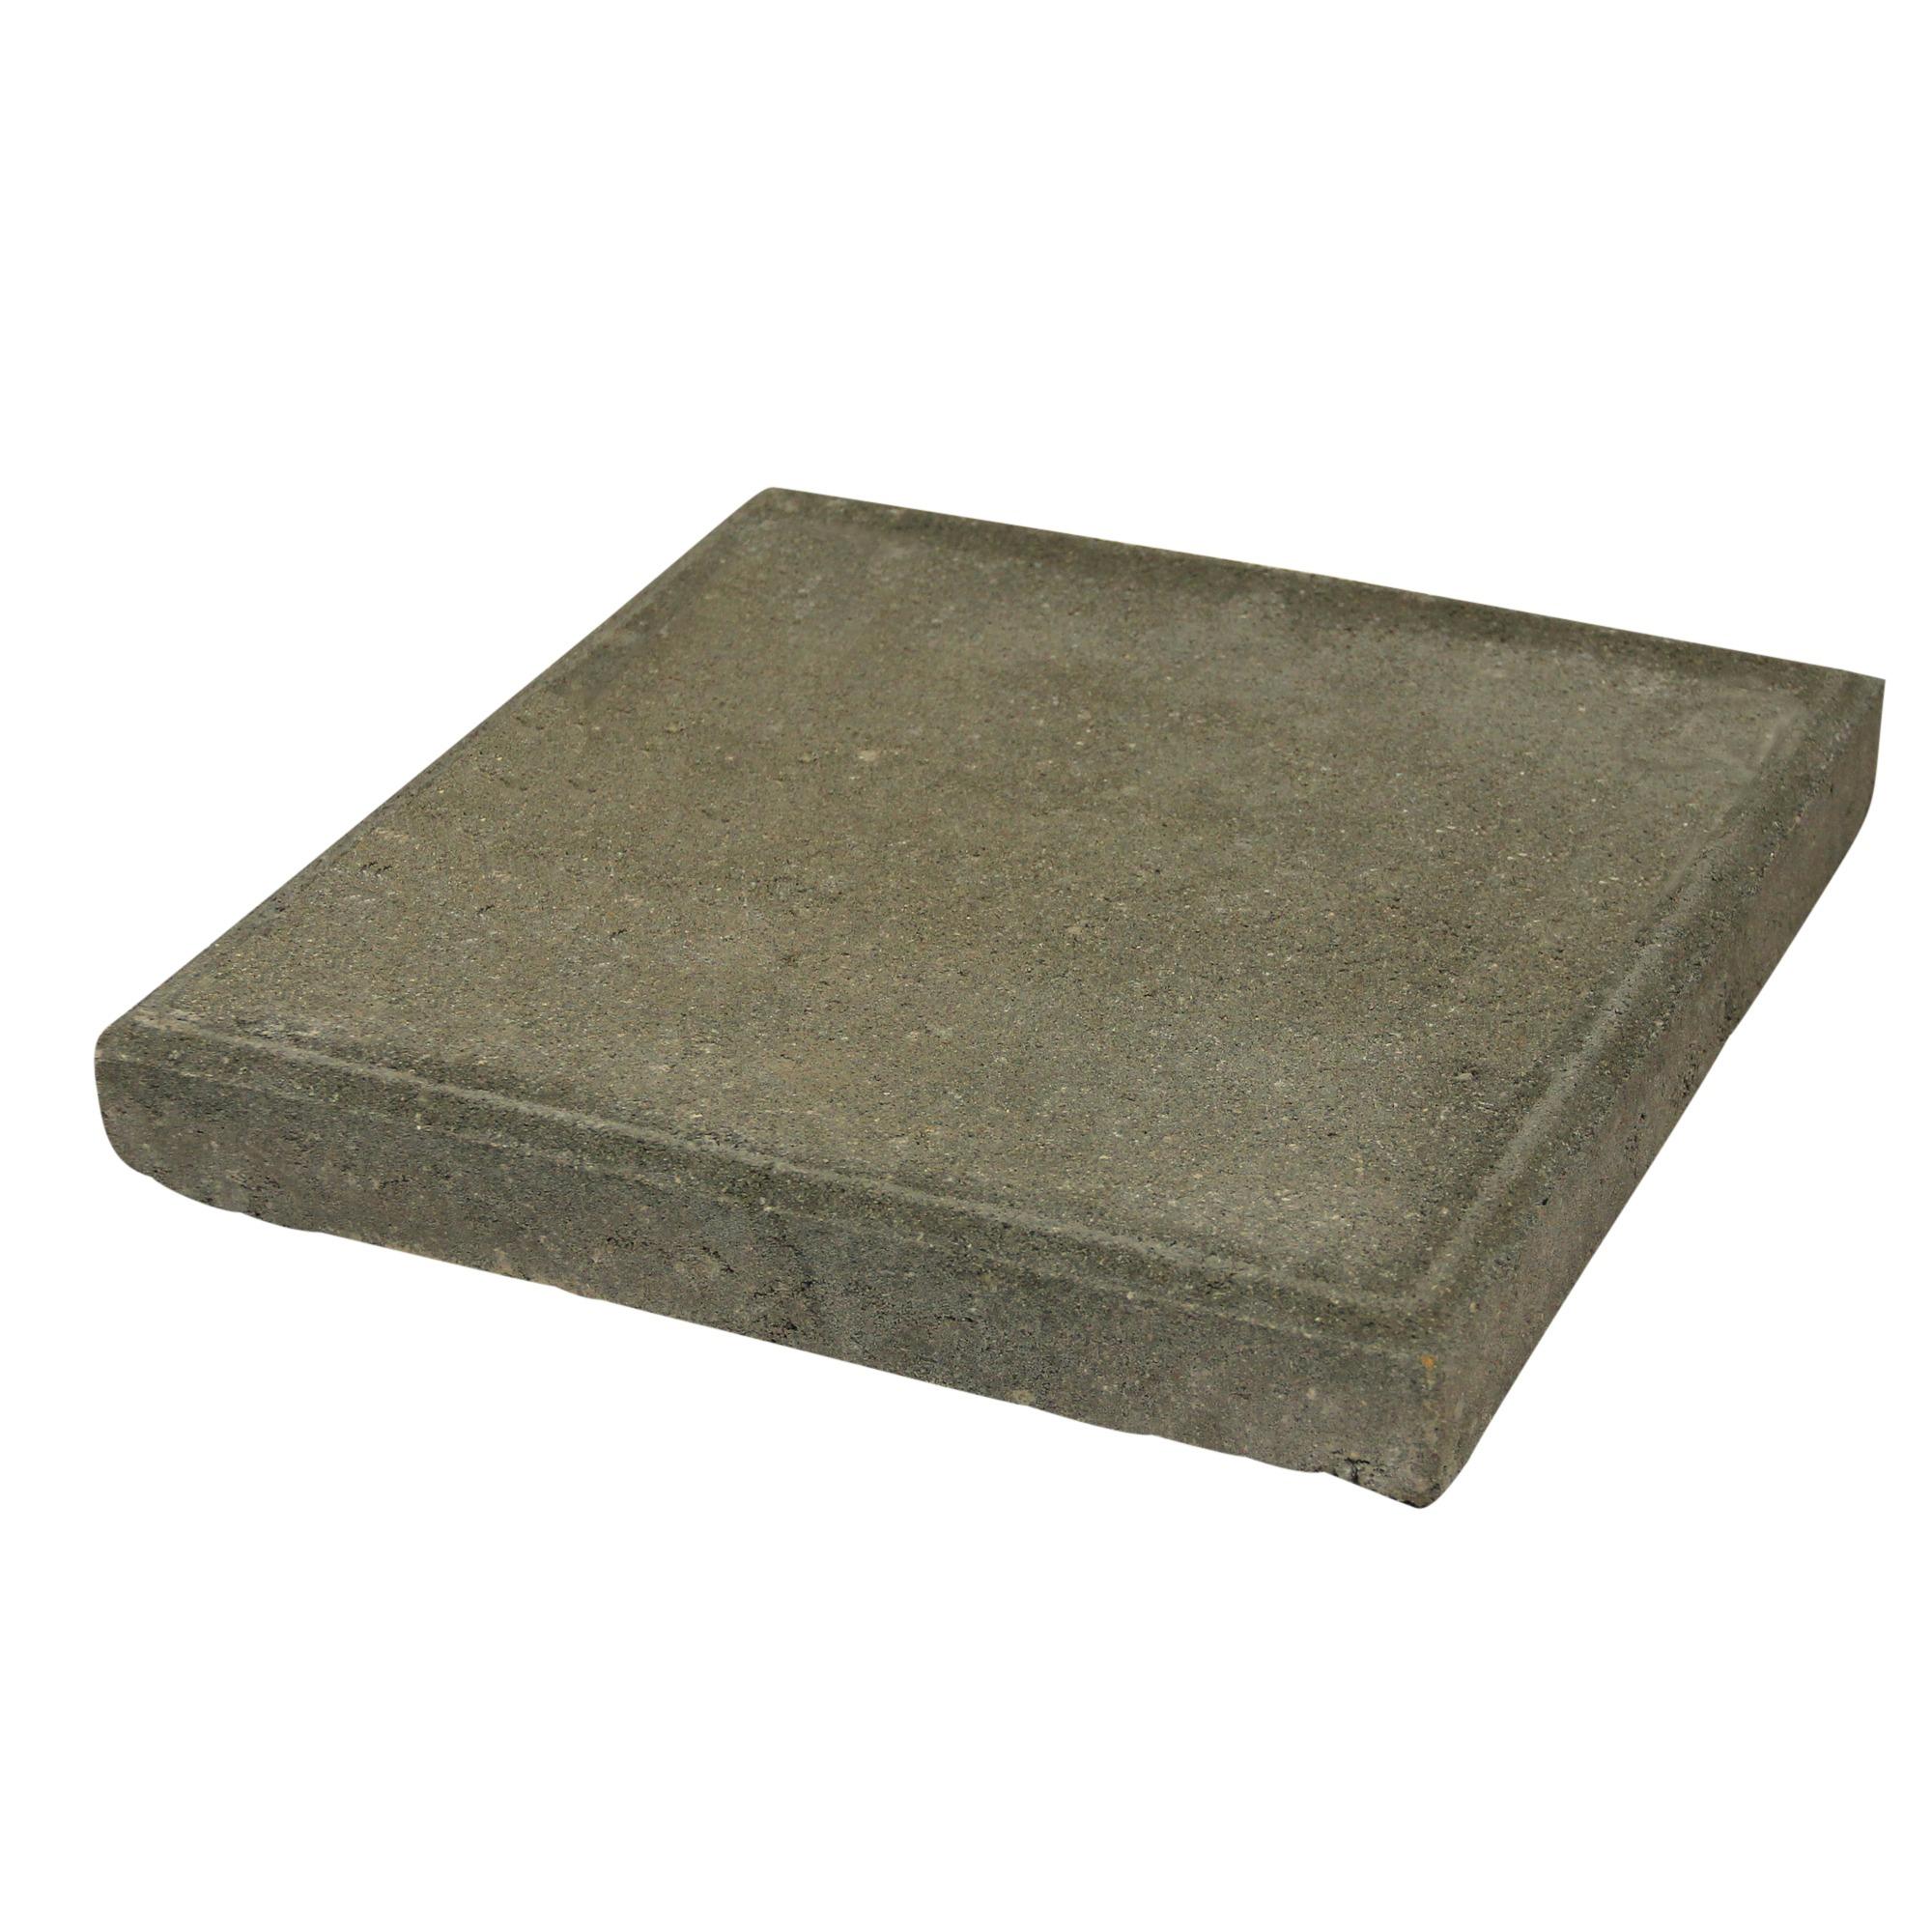 Betontegel Grijs 30x30 cm - Per Tegel - 0,09 m2